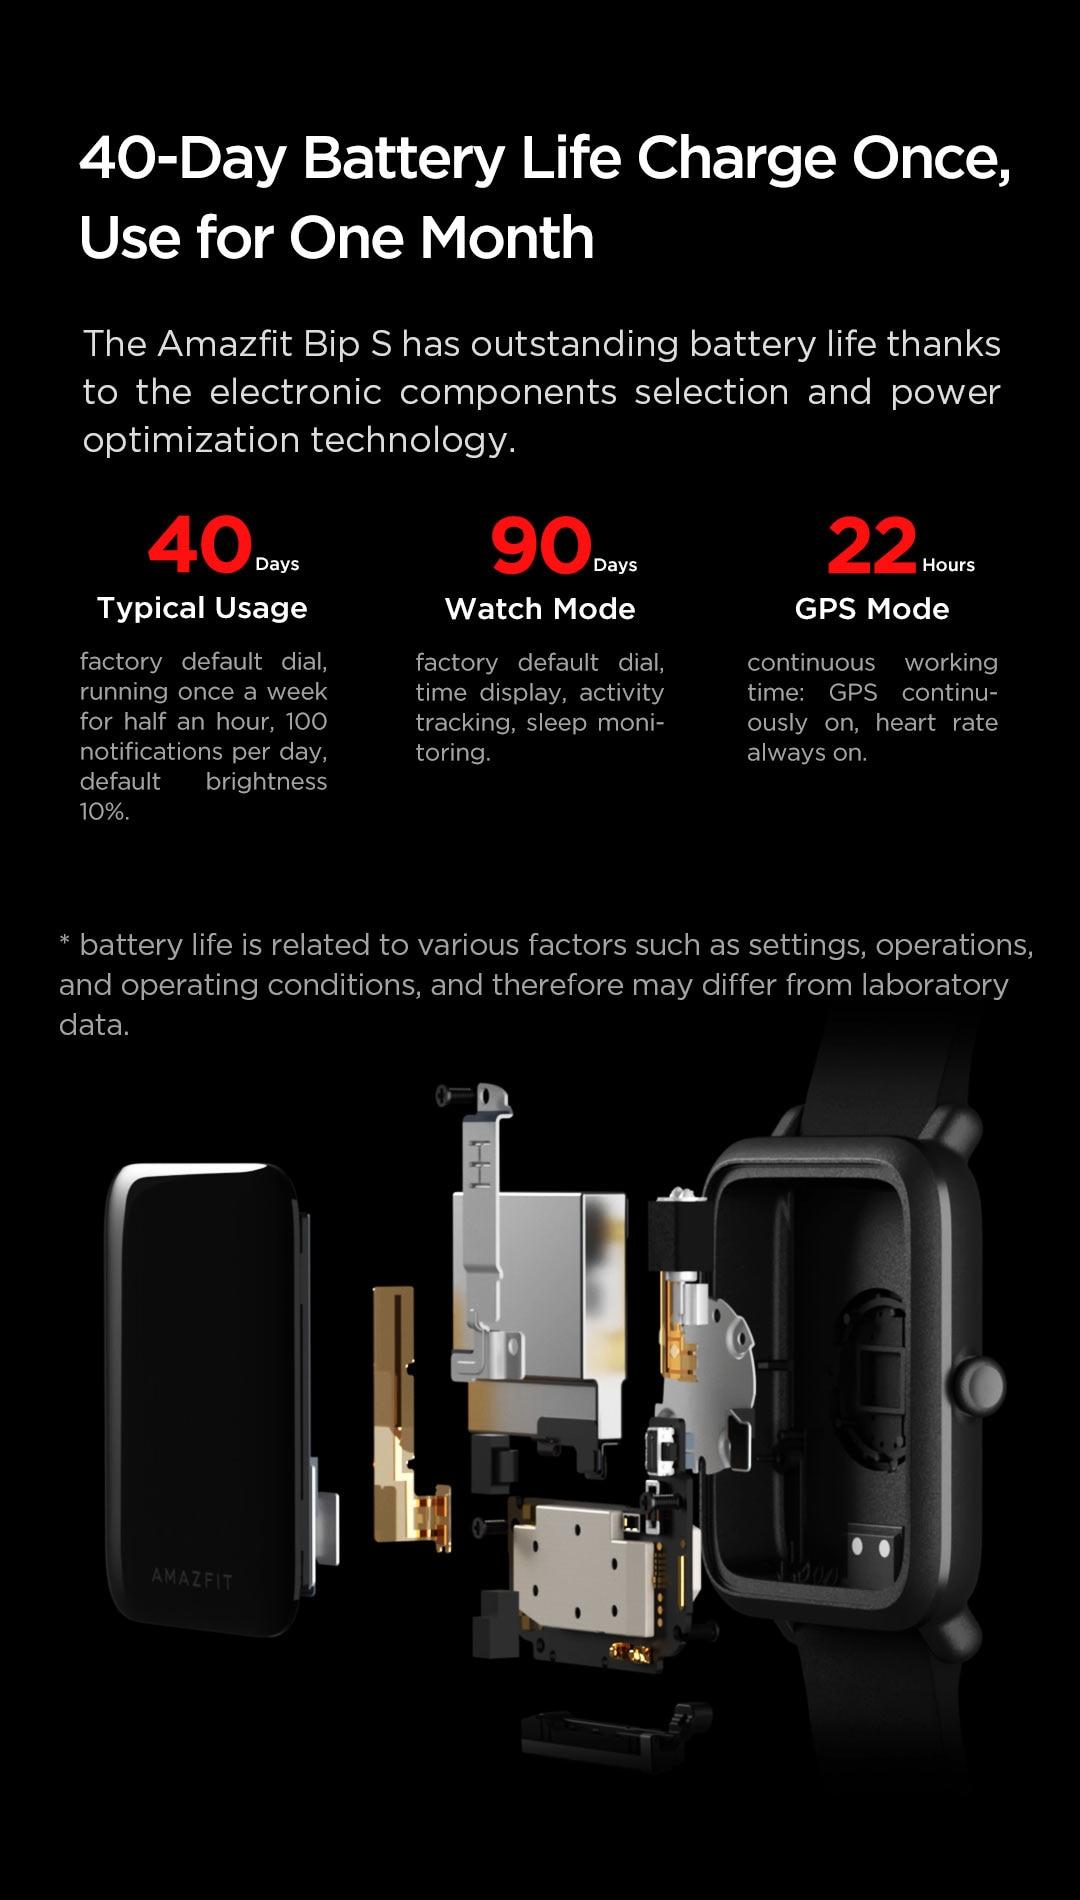 H64f538ffa6b941a8ae2b071ac3f0f1336 In Stock 2020 Global Amazfit Bip S Smartwatch 5ATM waterproof built in GPS GLONASS Smart Watch for Android iOS Phone